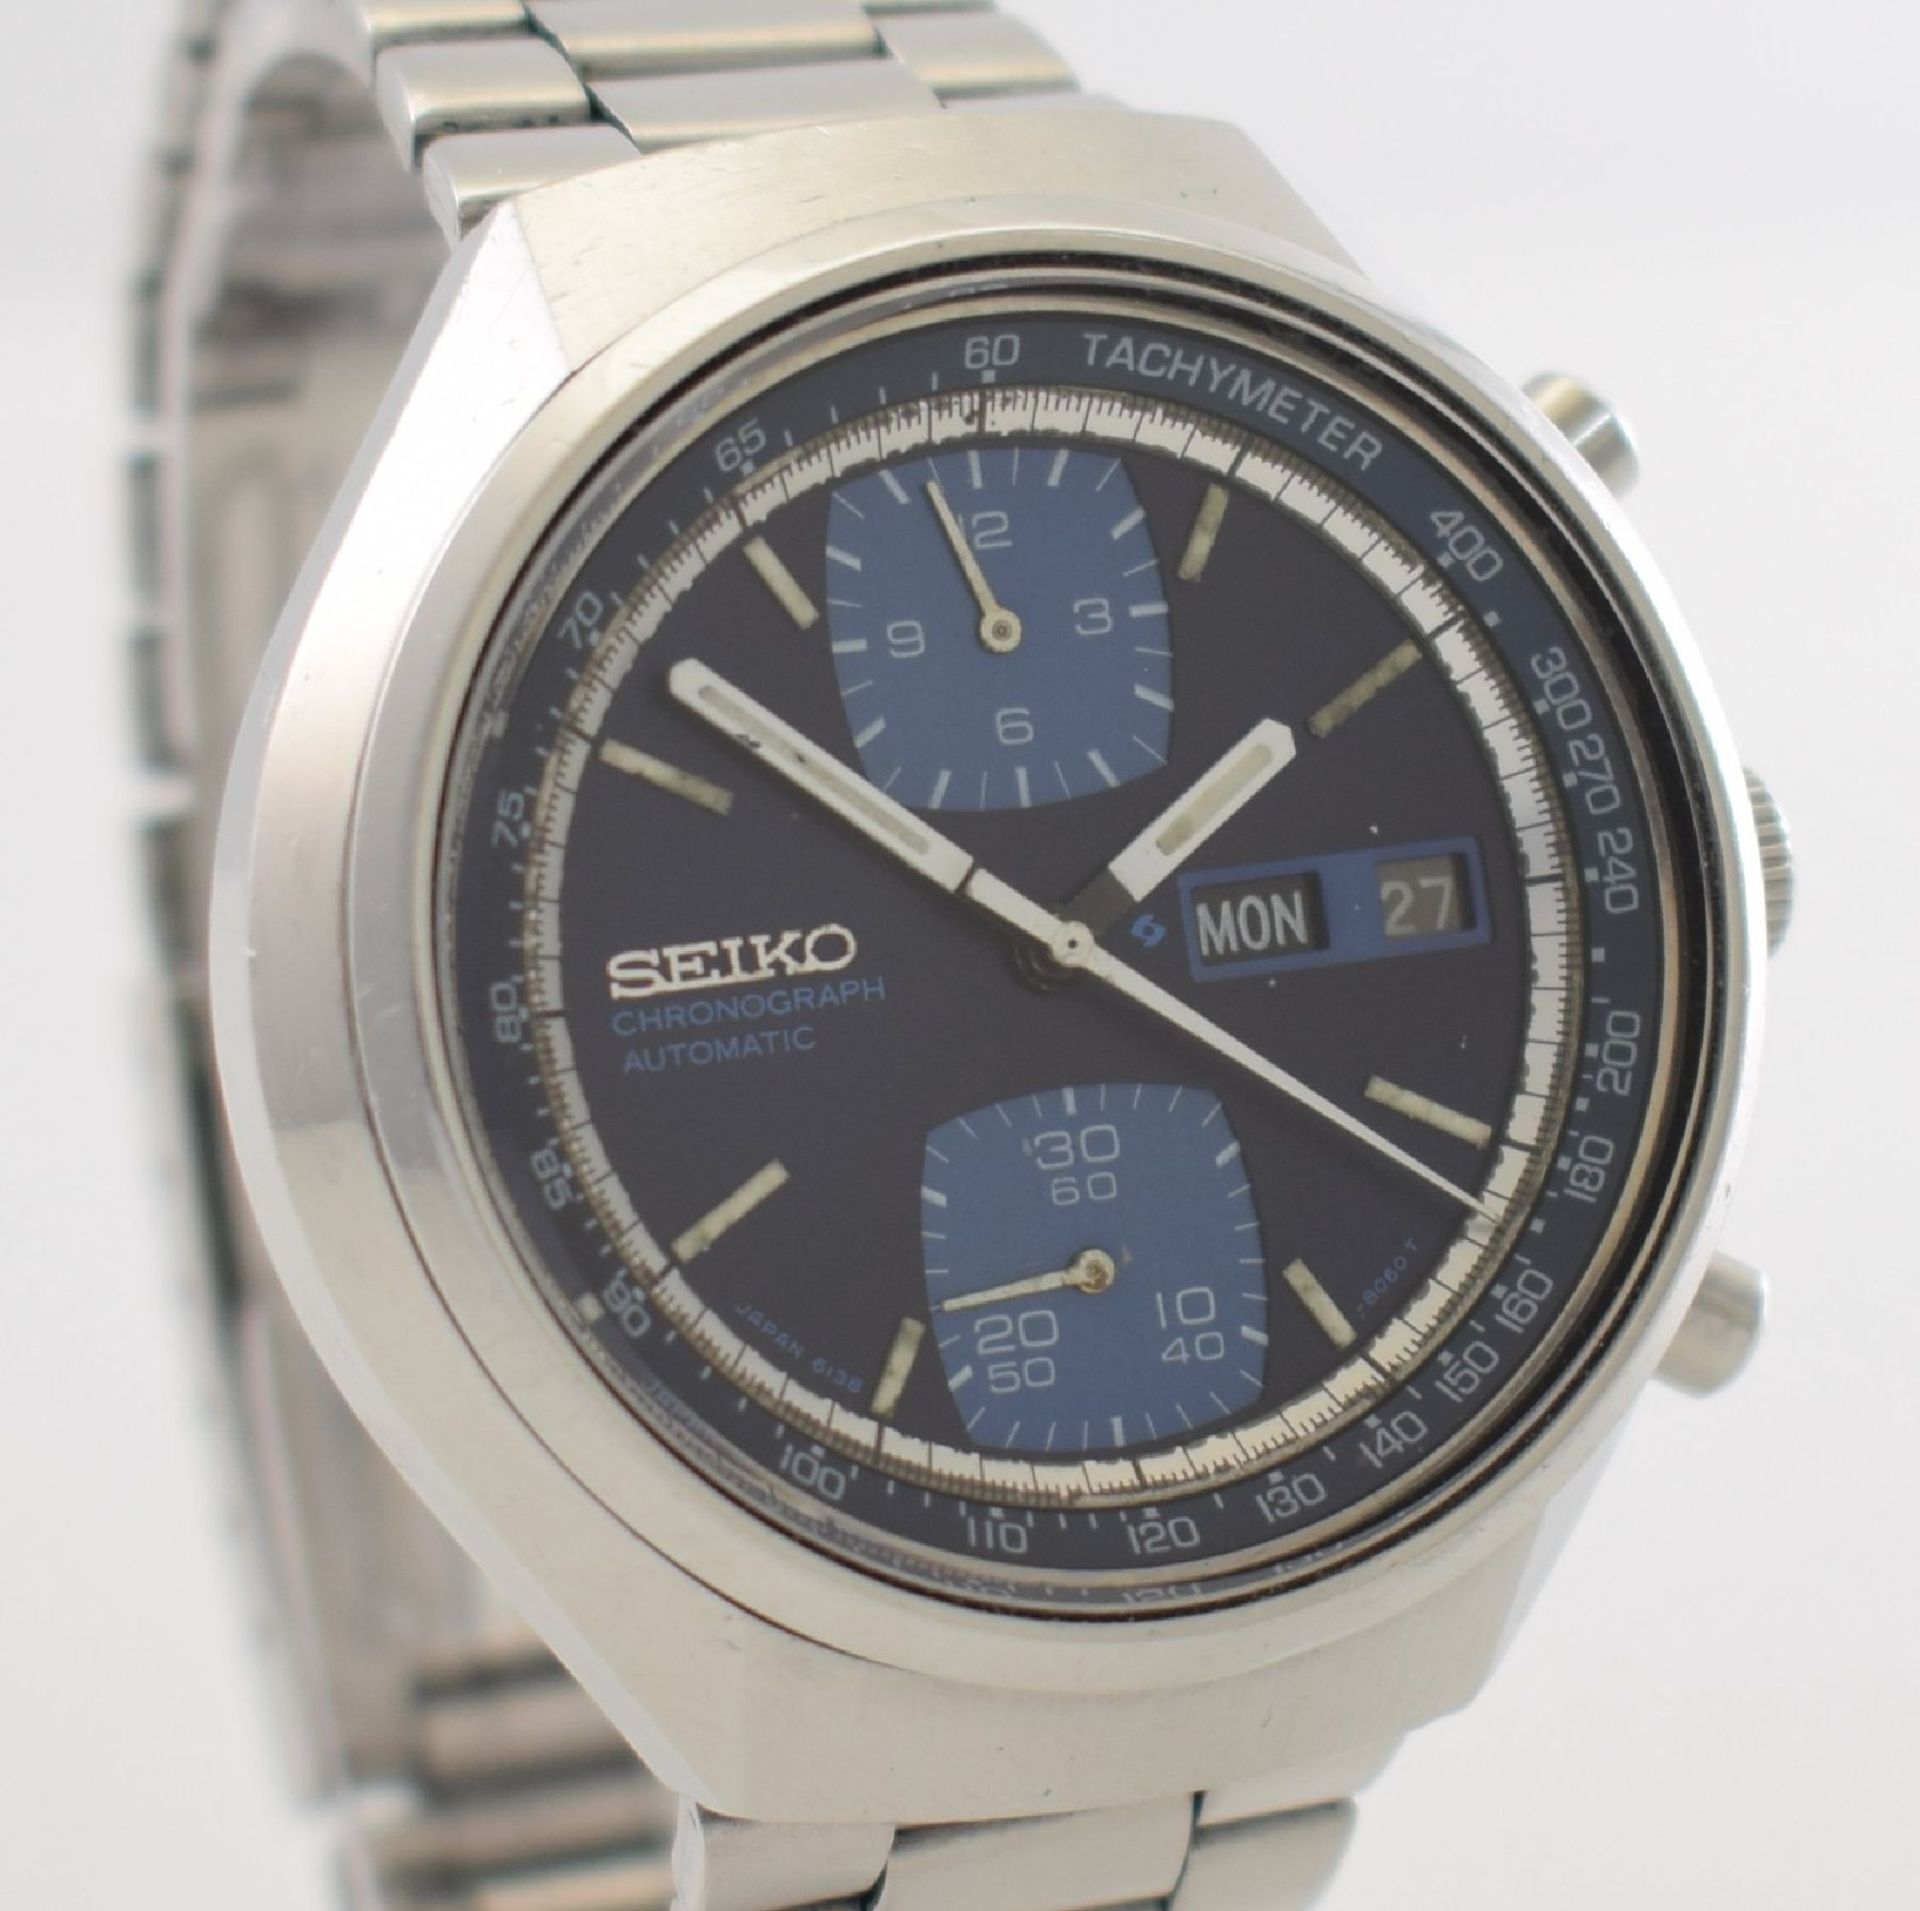 SEIKO Herrenarmbanduhr mit Chronograph, Japan um 1970, Automatik, Ref. 6138-8030, Edelstahlgeh. - Bild 6 aus 7